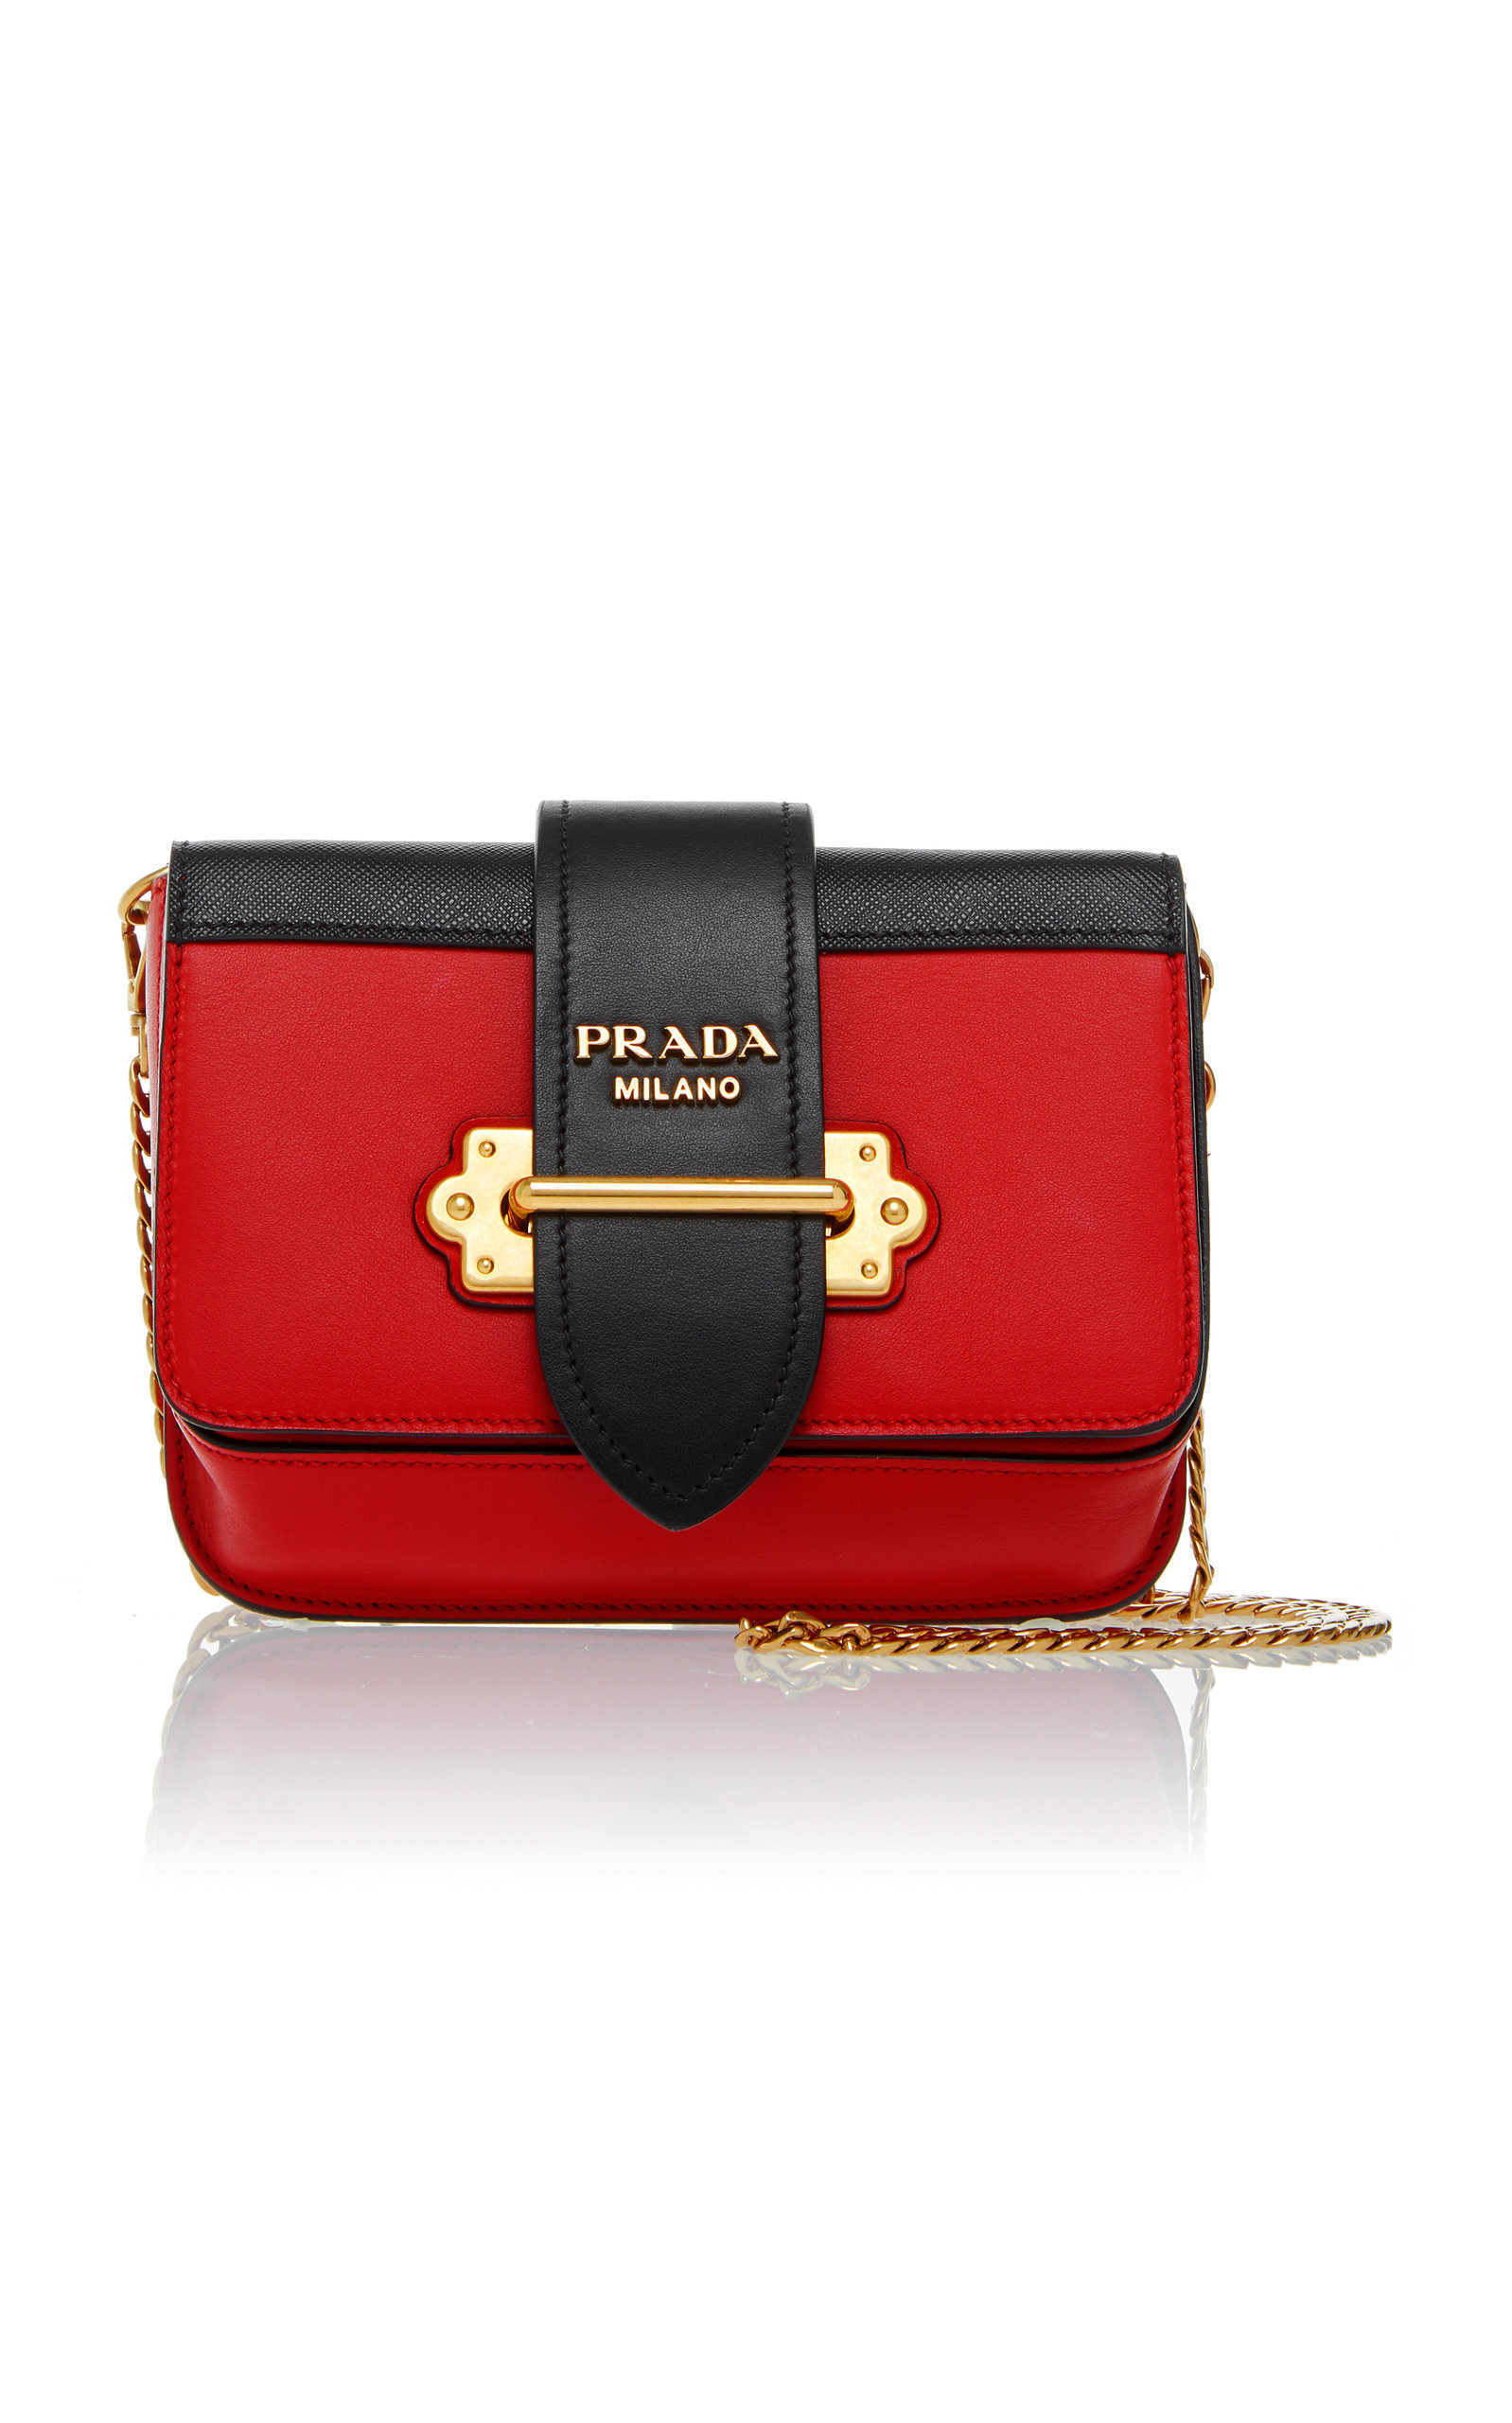 9547c79ad12c PradaCahier Belt Bag. CLOSE. Loading